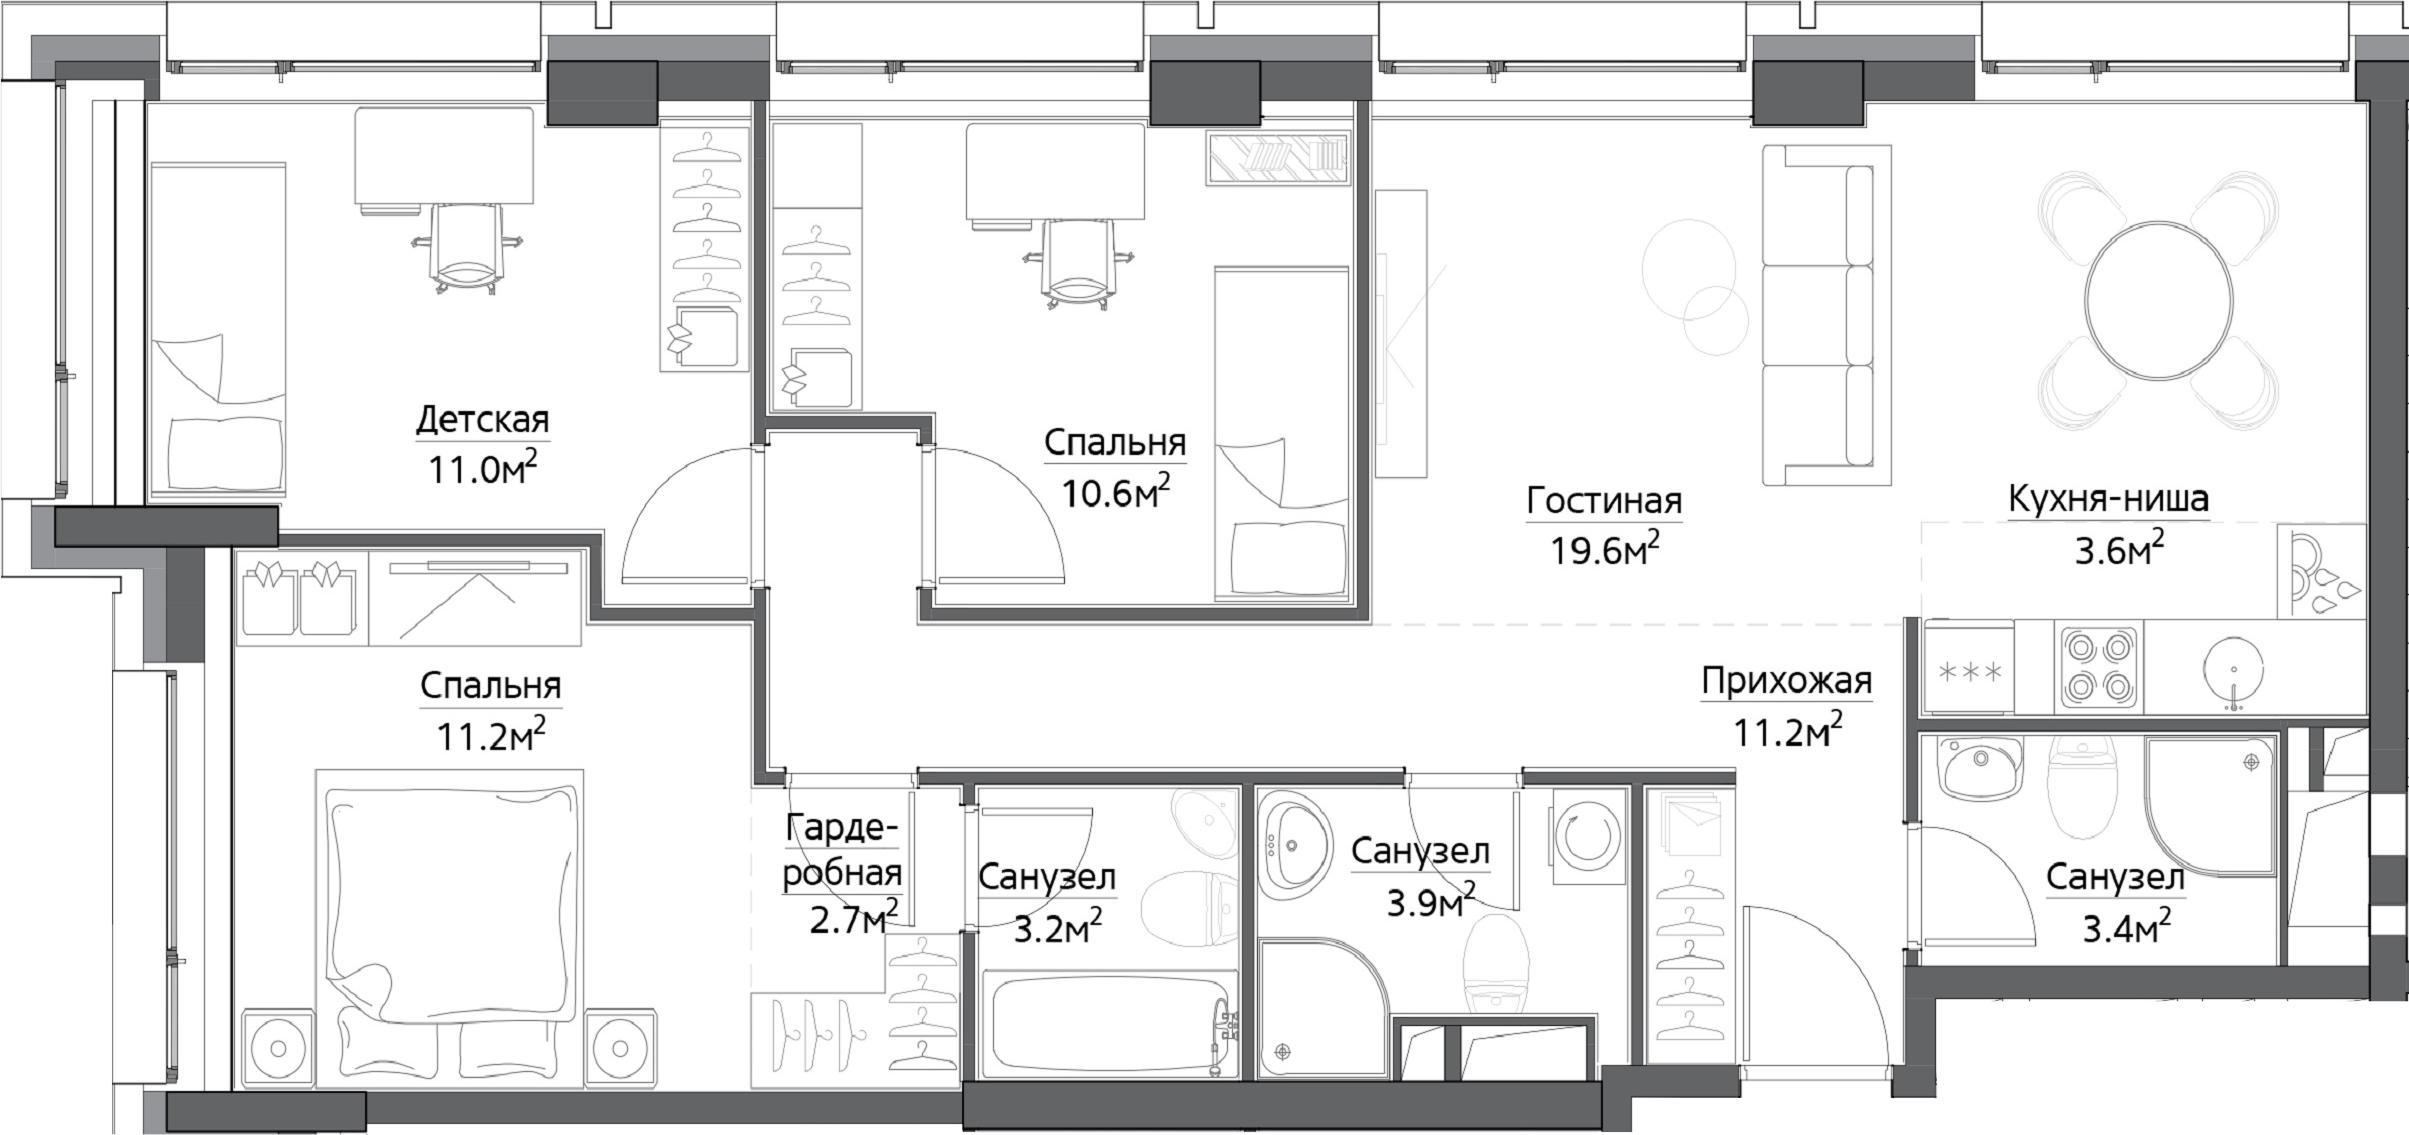 4Е-к.кв, 77.7 м²